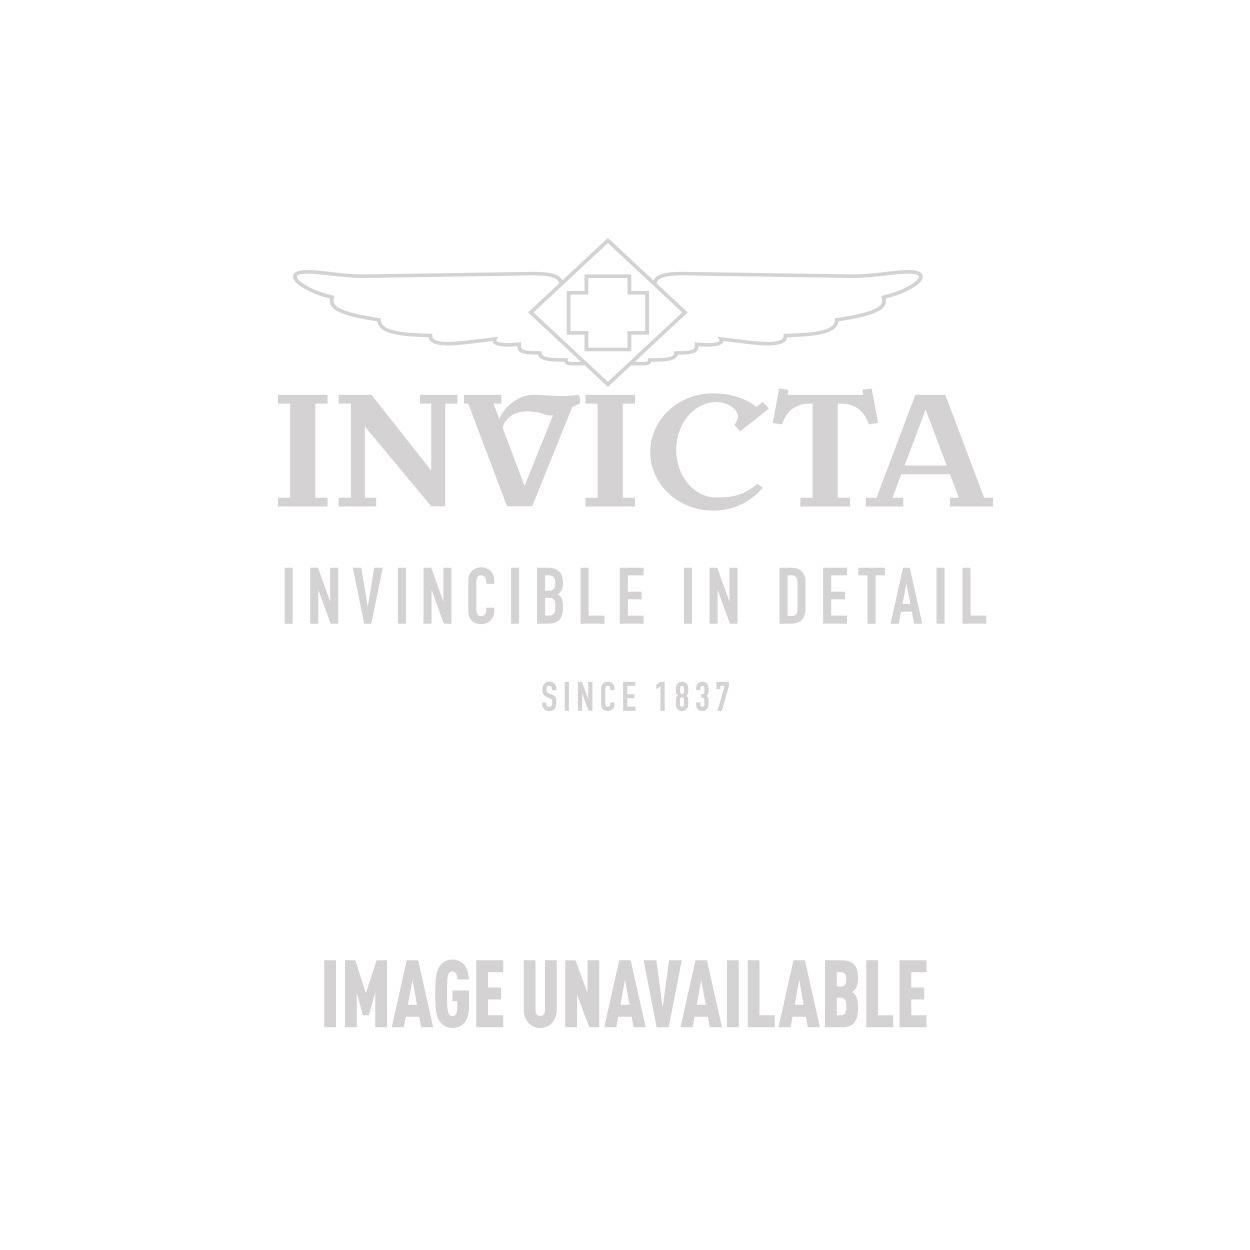 Invicta Bolt Zeus Swiss Made Quartz Watch - Gold case with Black tone Polyurethane band - Model 0828